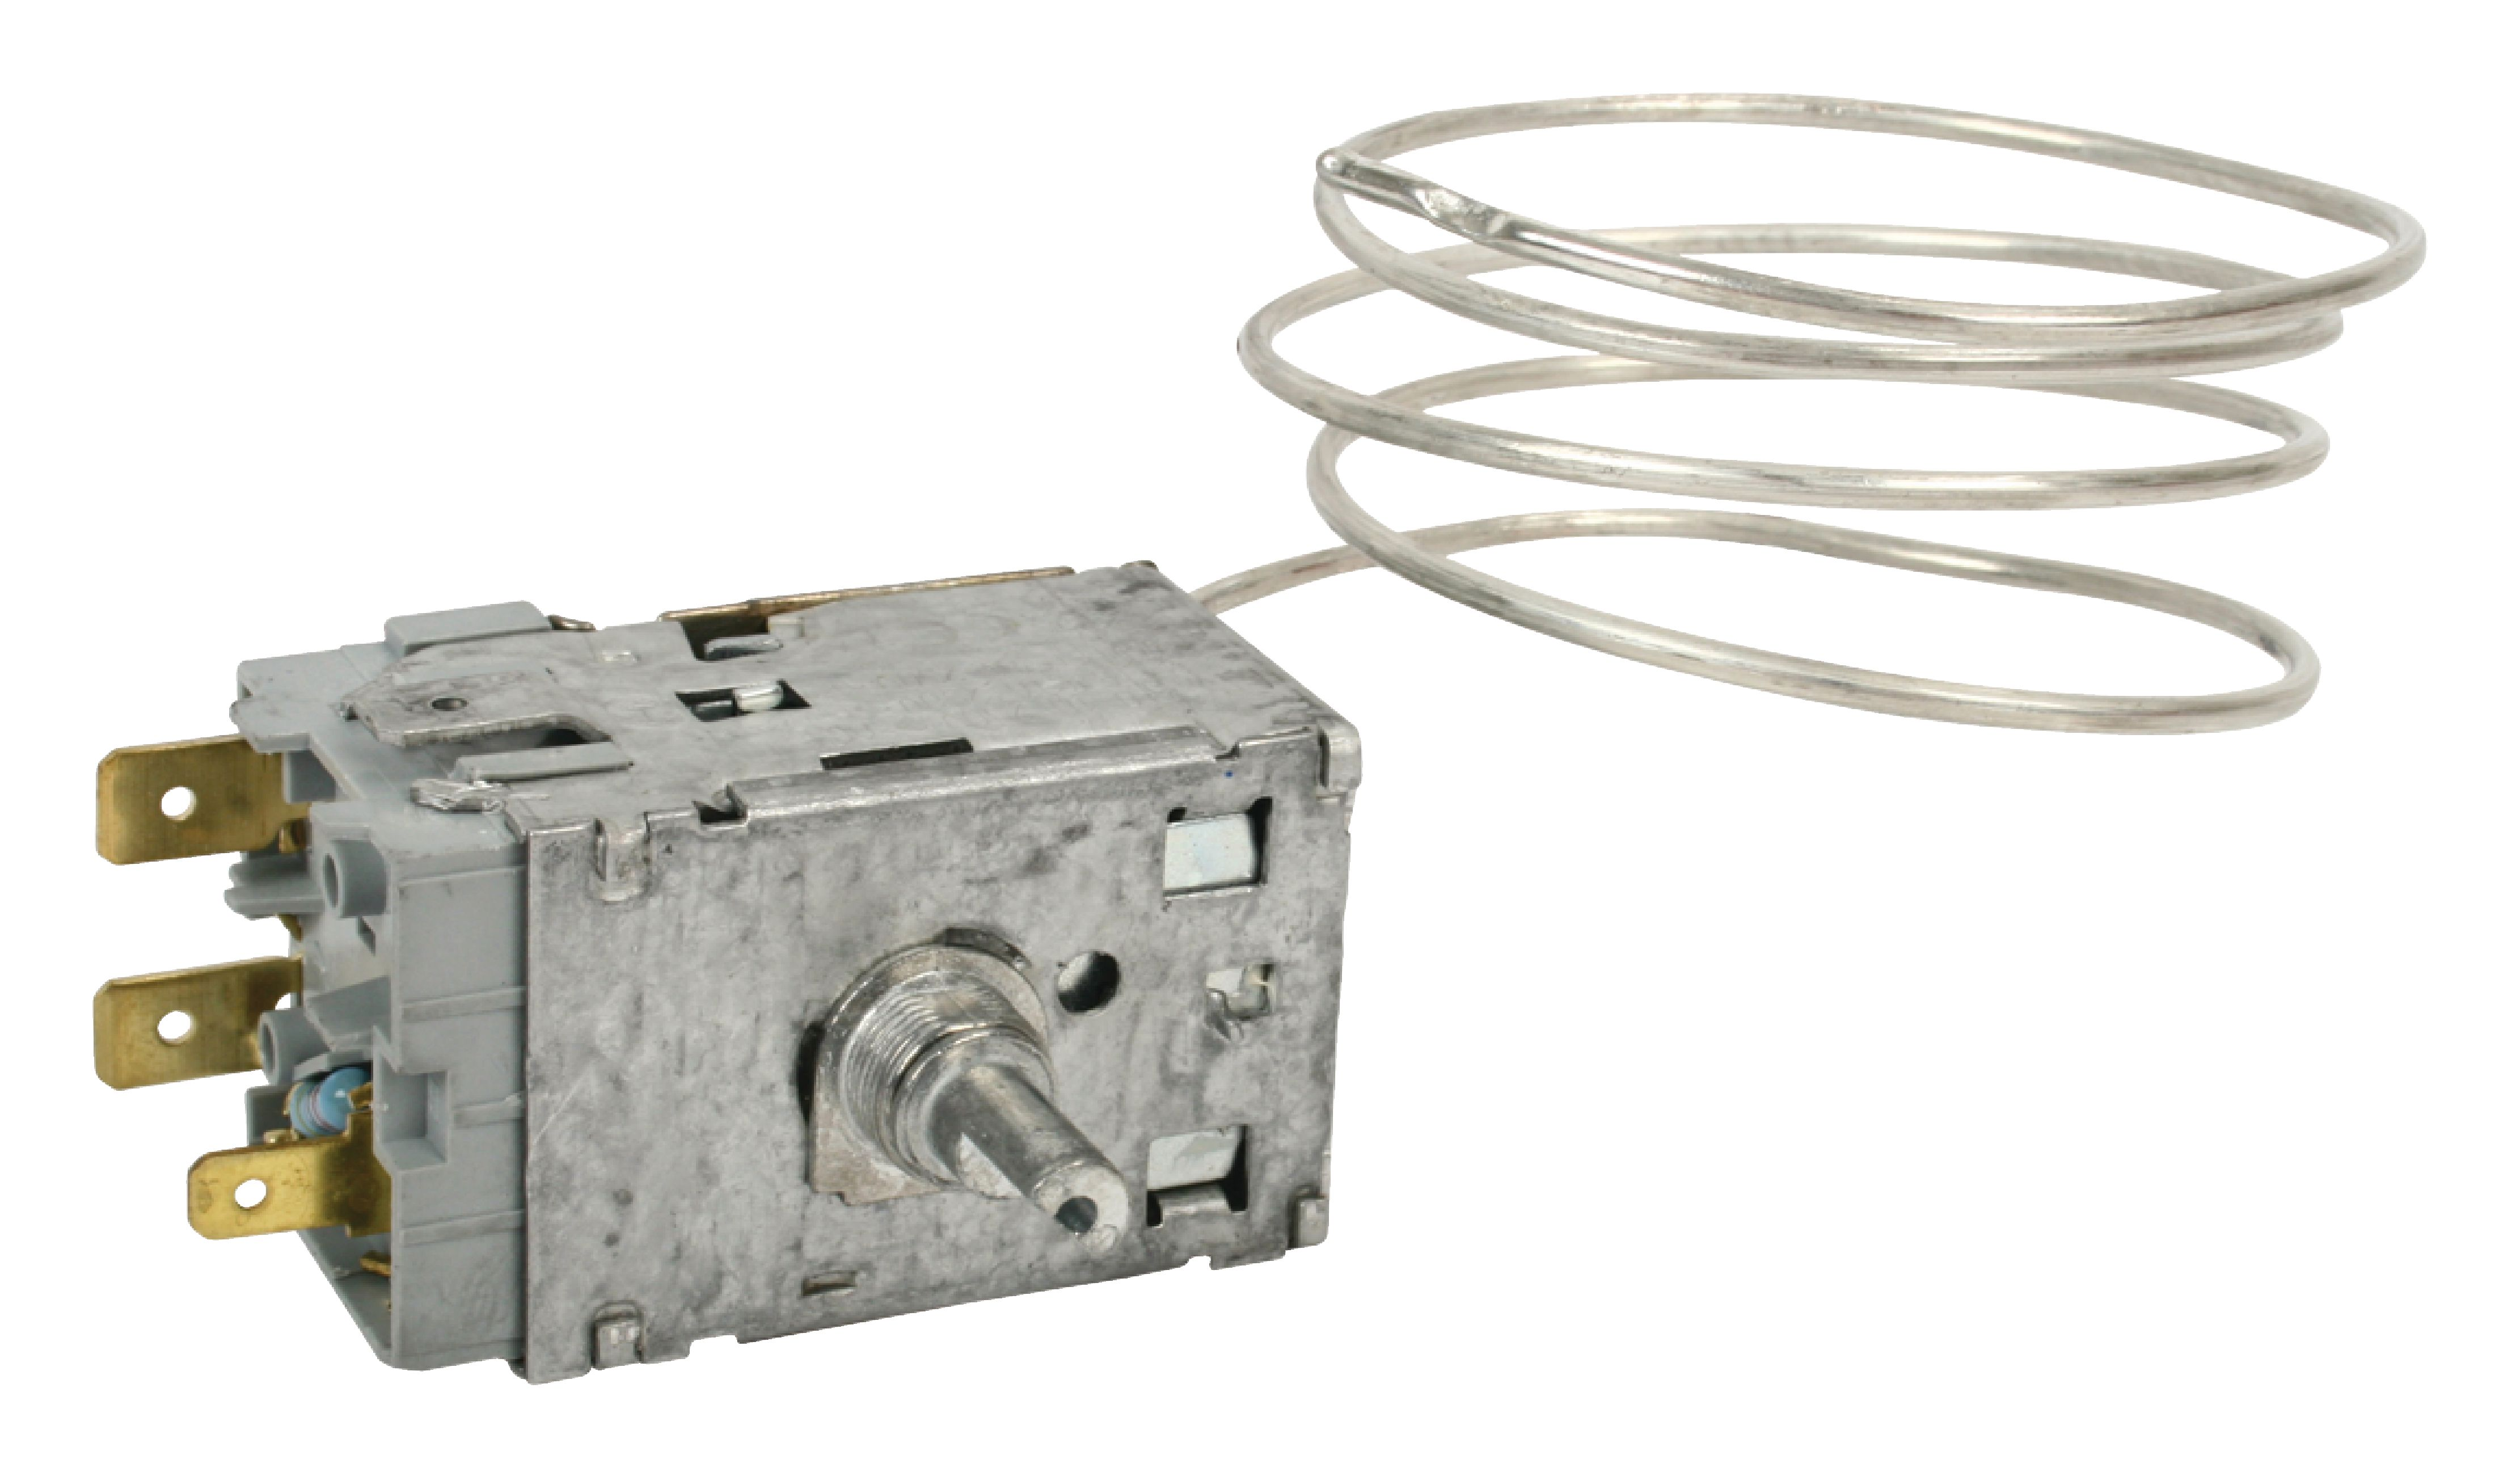 Termostat pro lednice, Whirlpool 484000008686